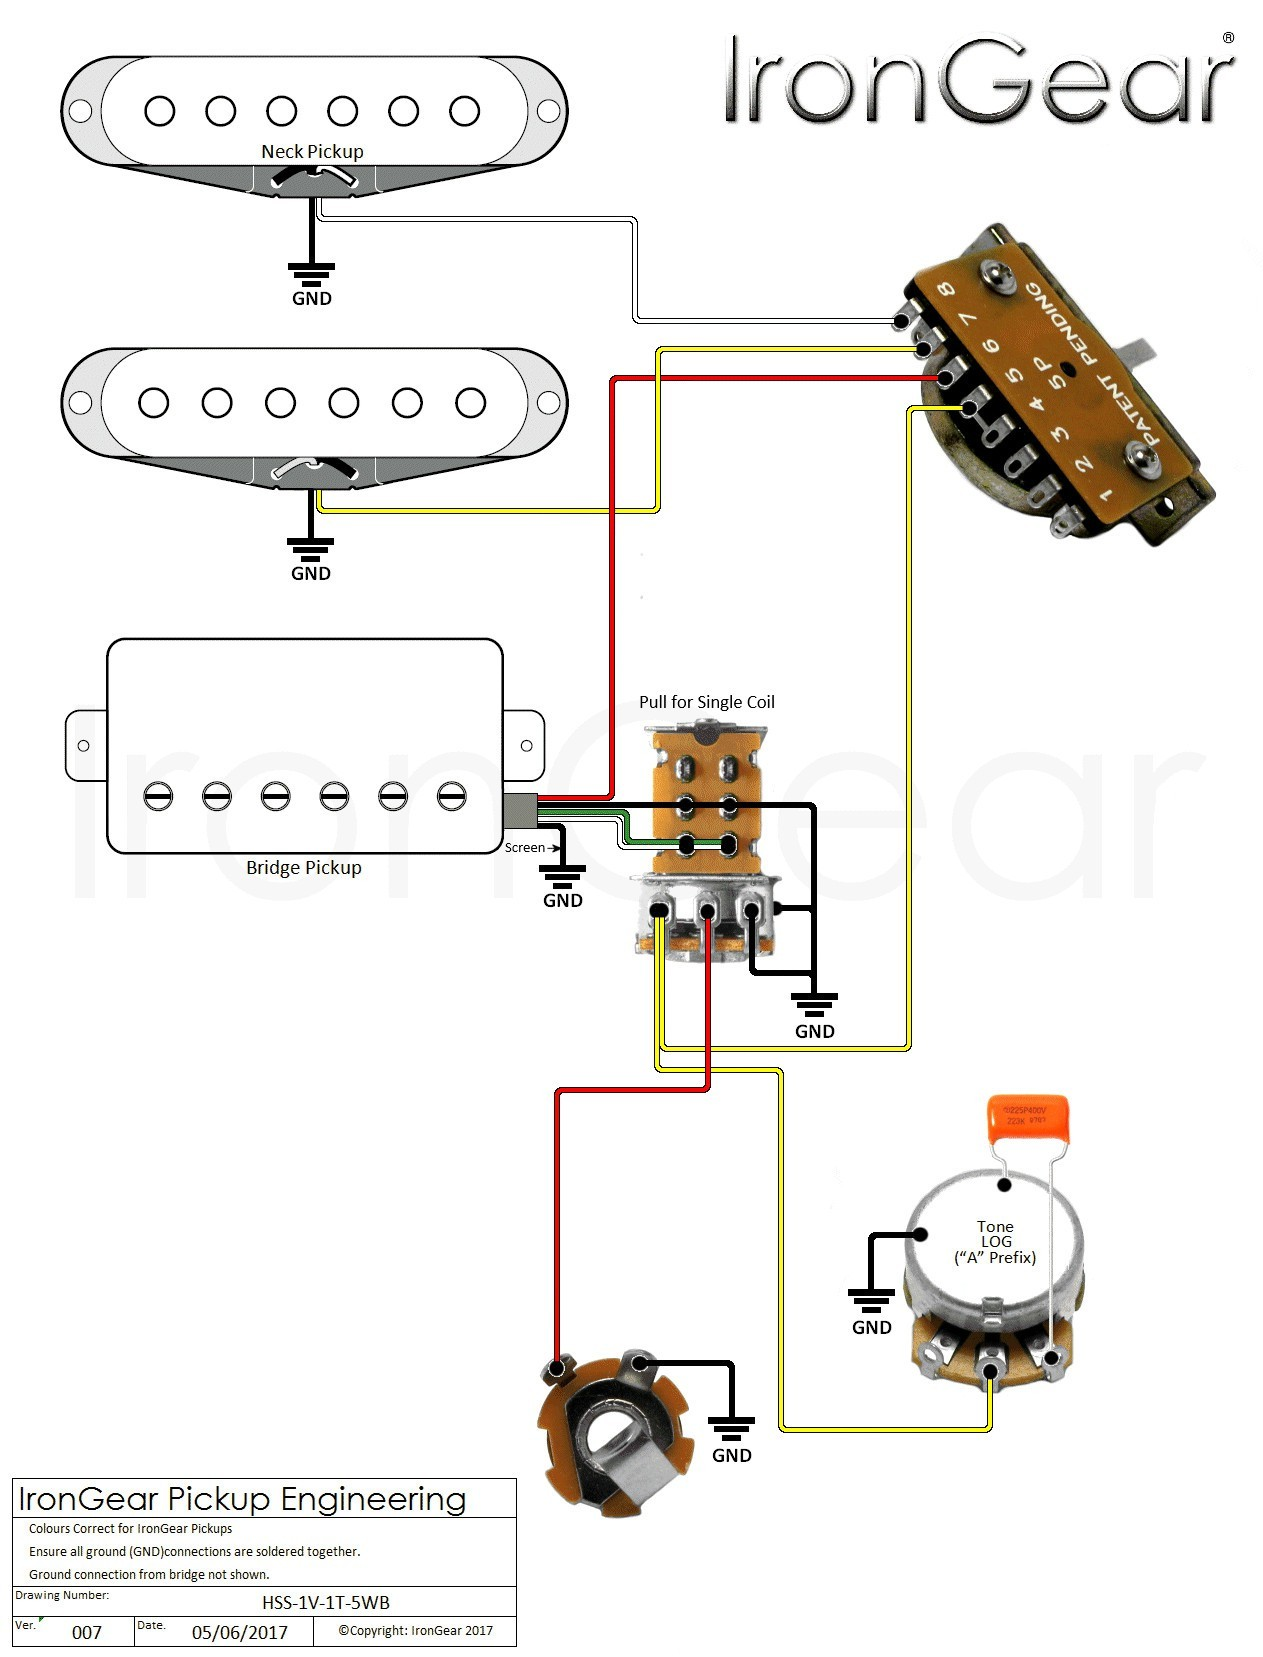 5 Way Switch Wiring Diagram Beautiful Hss 1vol Switched 1tone 5wb V07 Igwm 20 2 Humbuckers